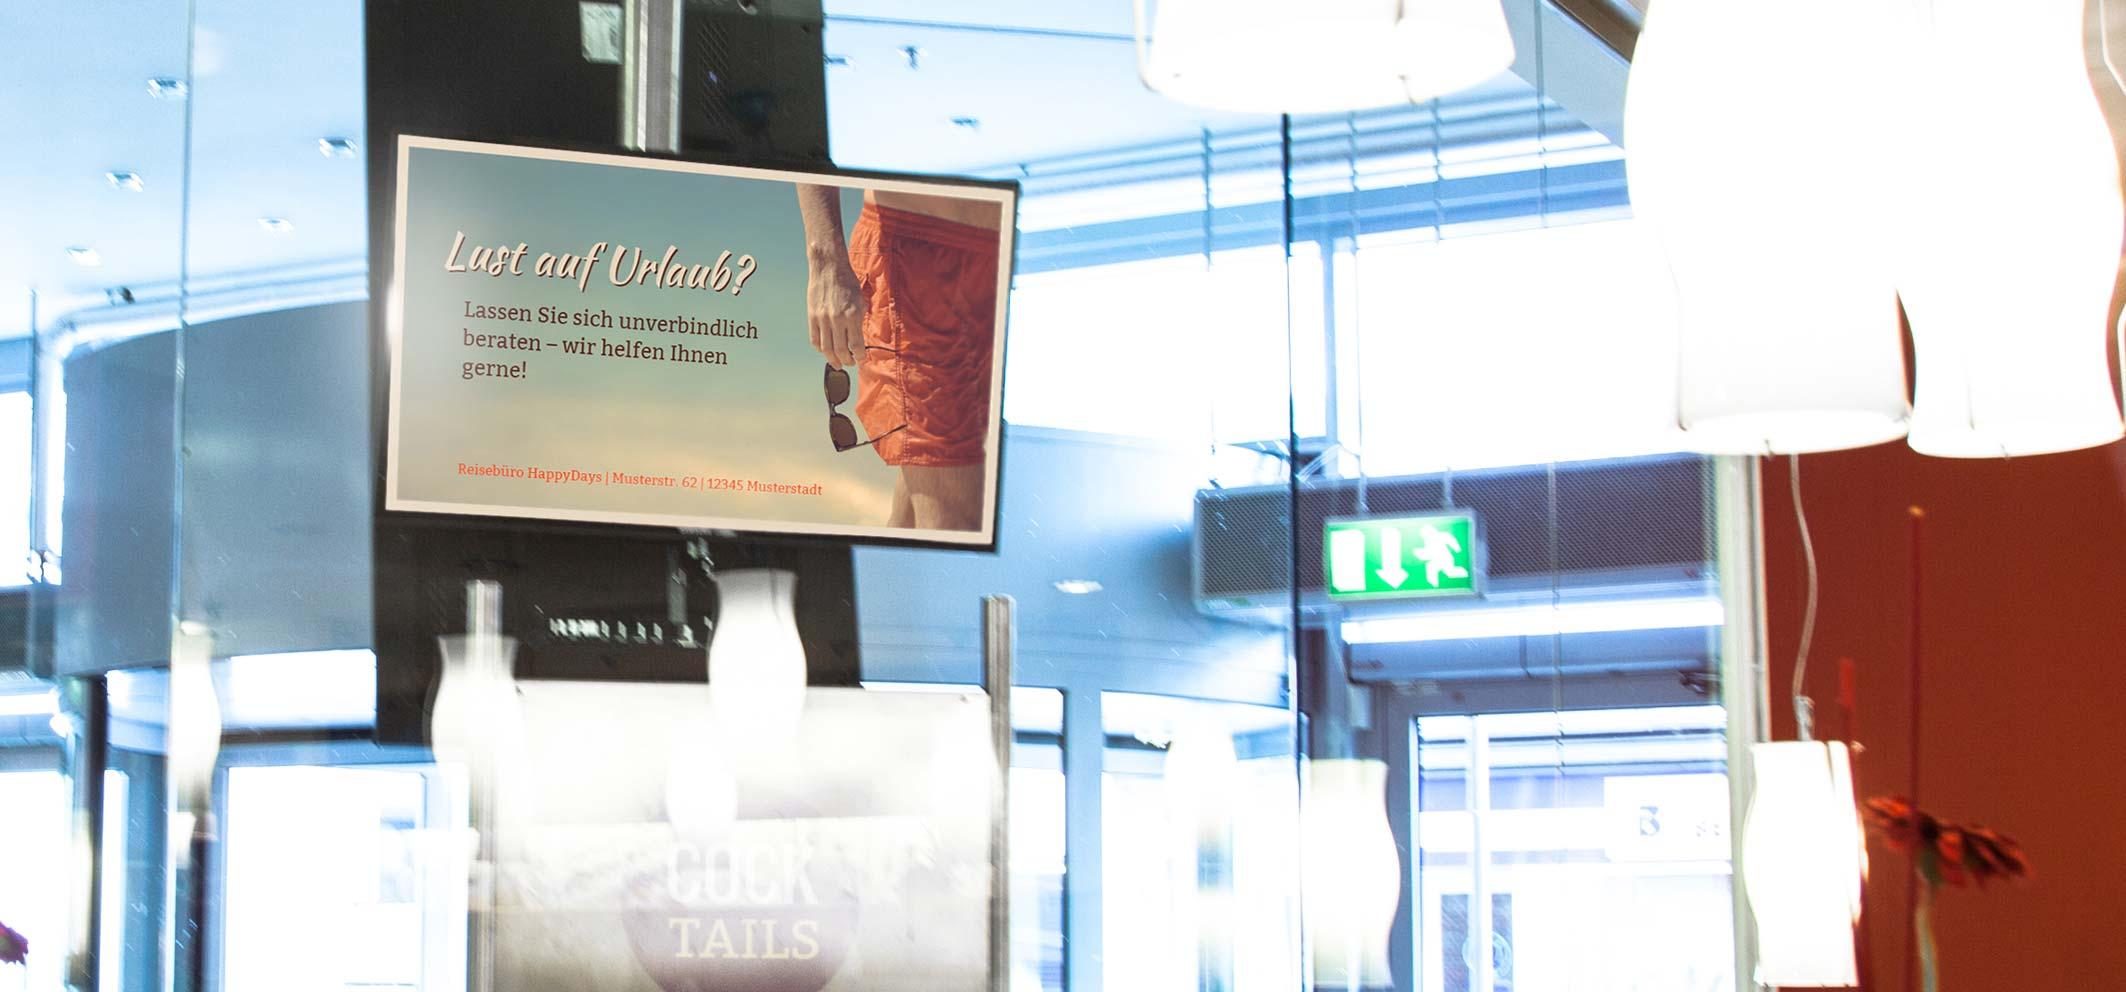 8 Gründe für Digital Signage im Reisebüro